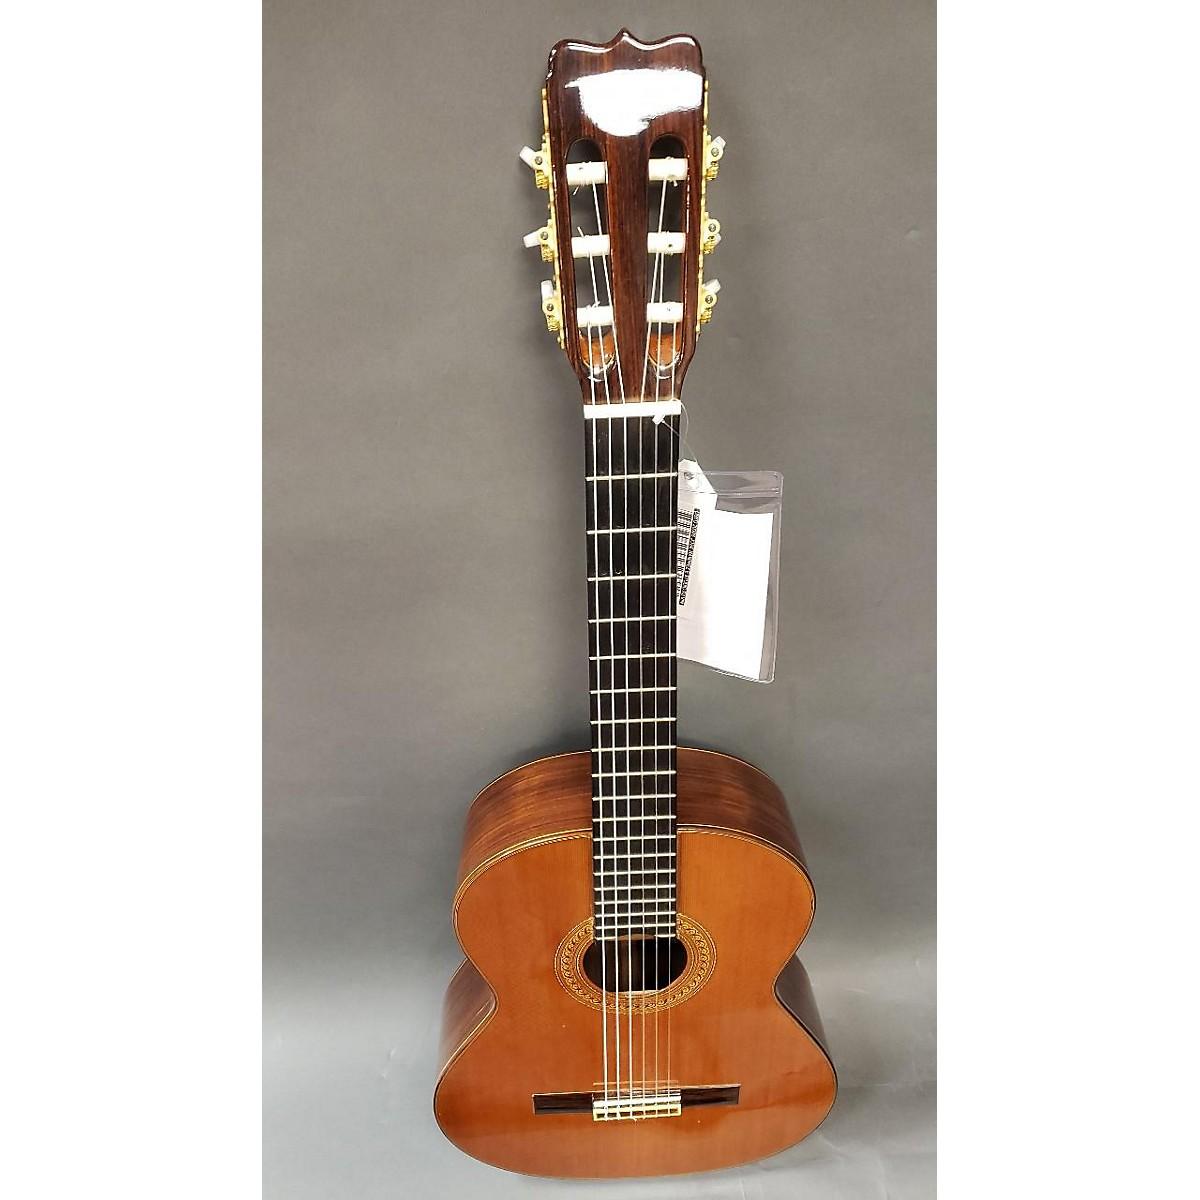 Jose Ramirez 2000s E Studio R3 Classical Acoustic Guitar